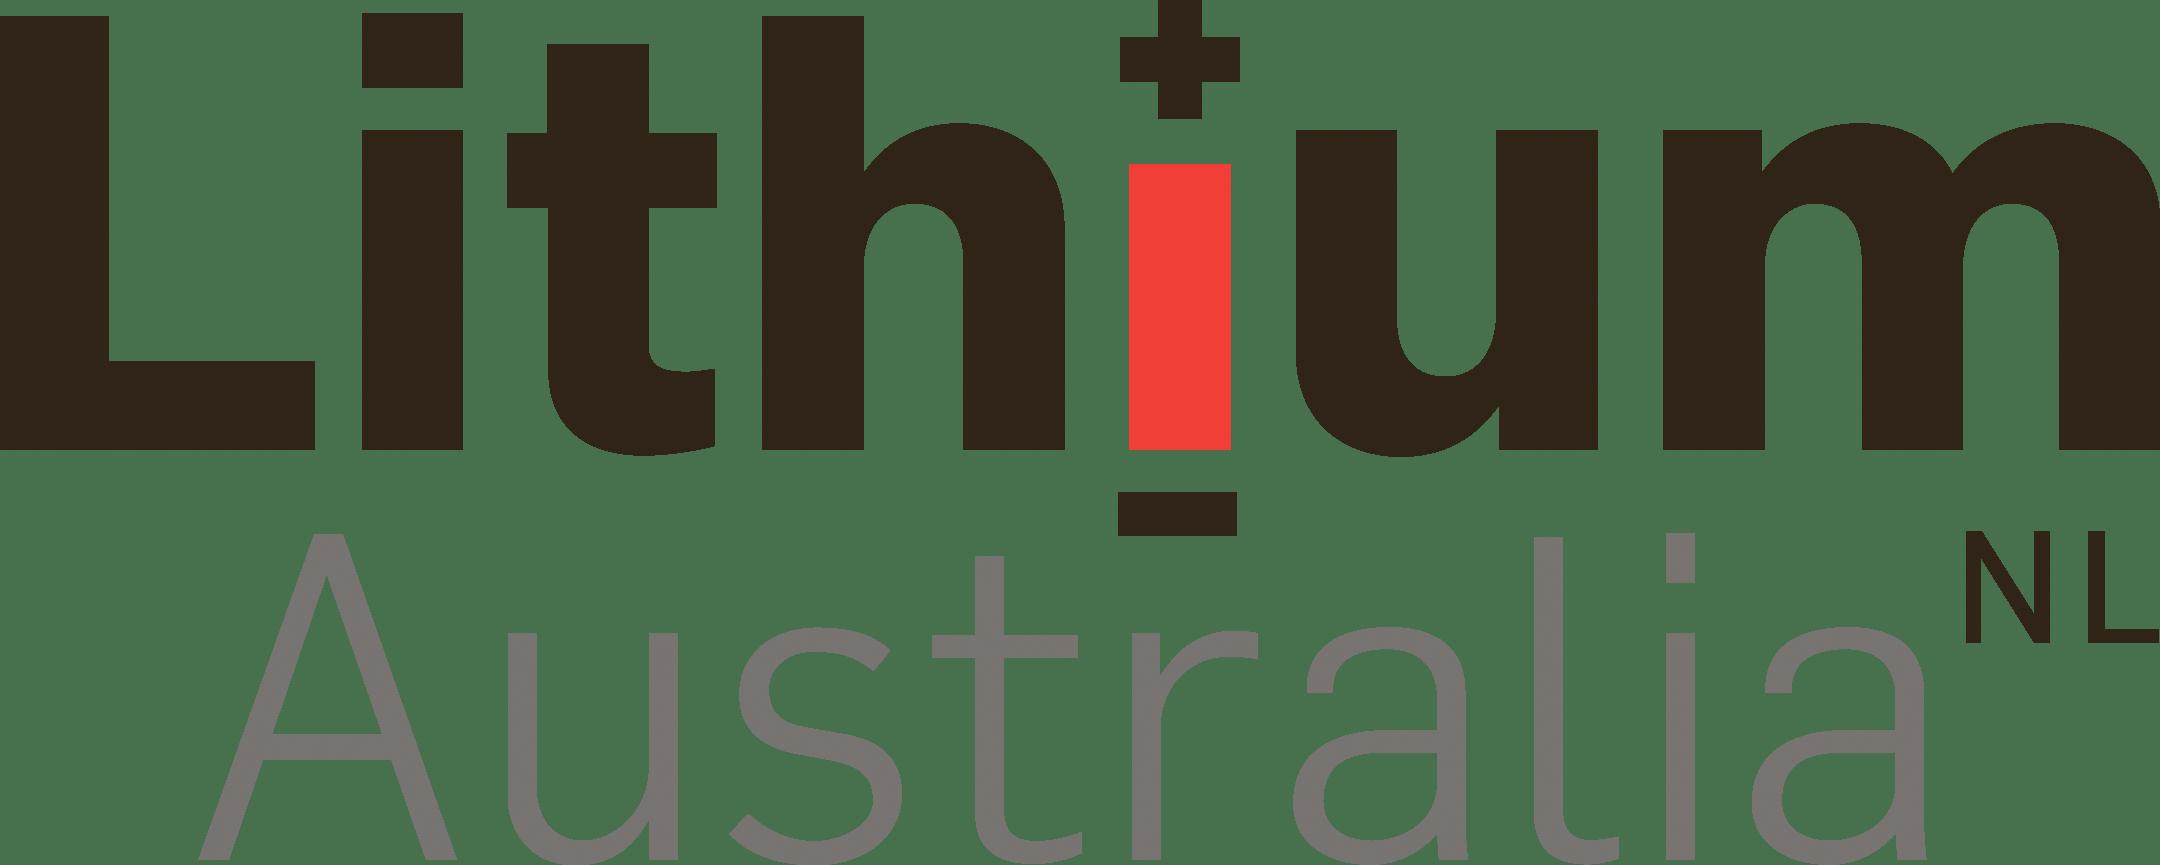 Lithium Australia logo